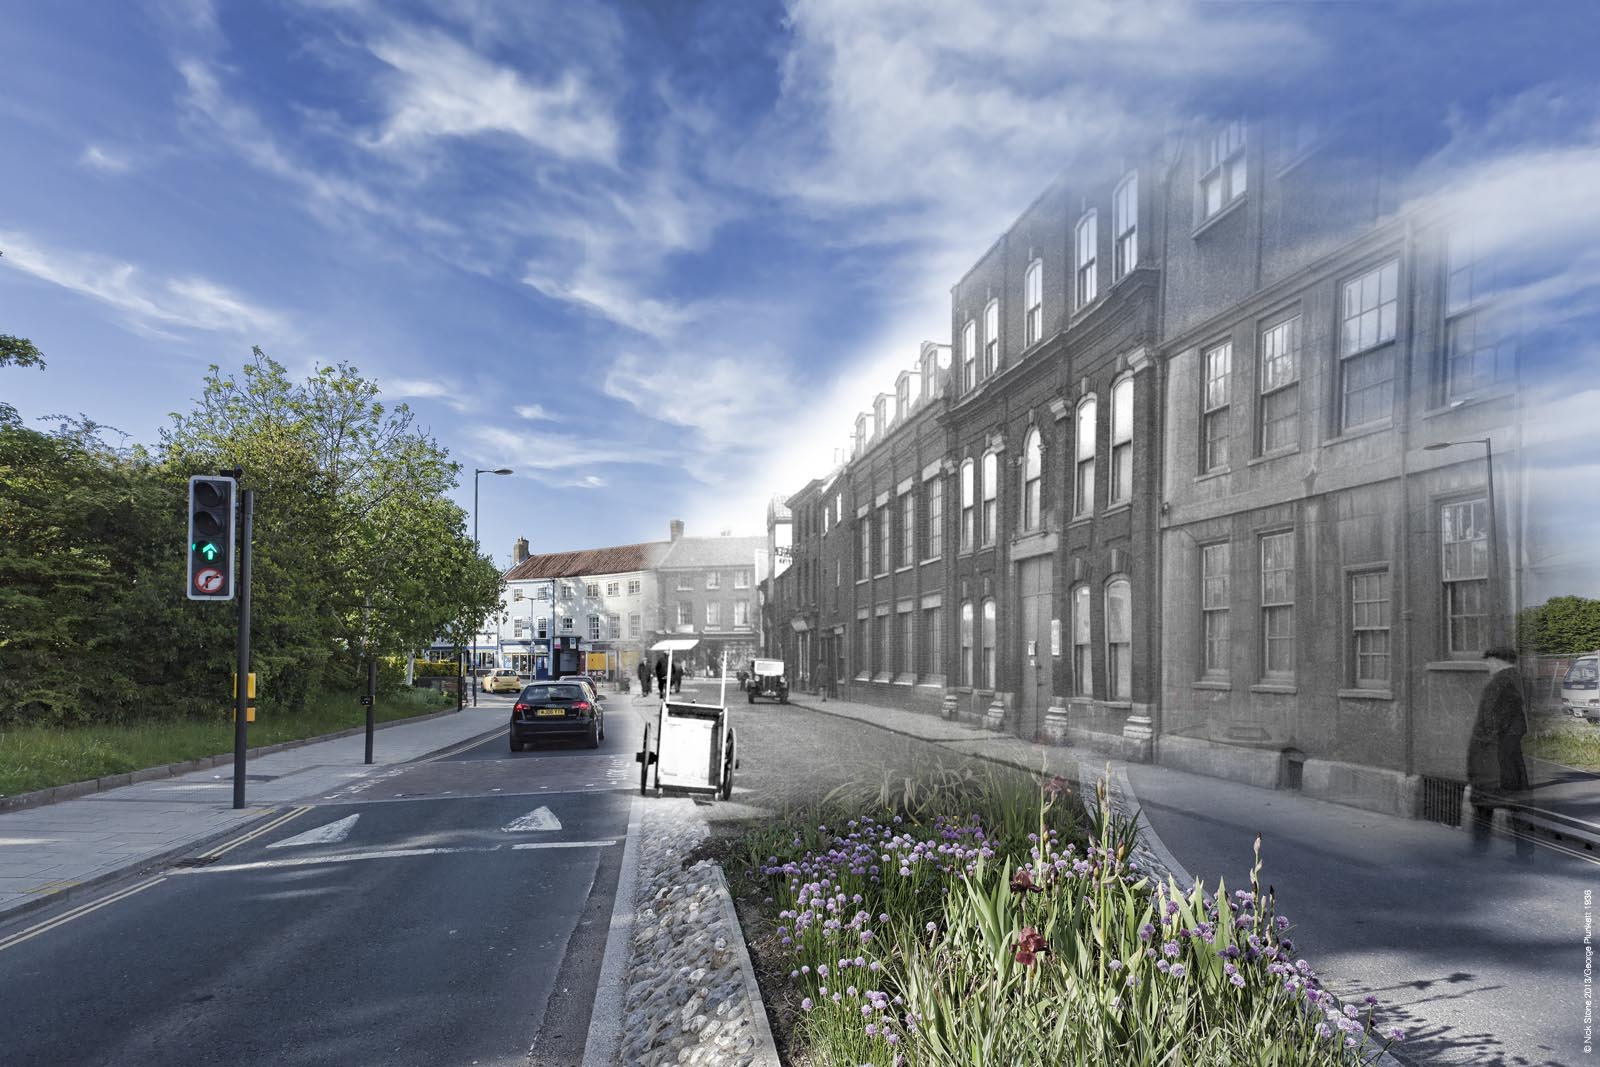 Pitt street norwich history